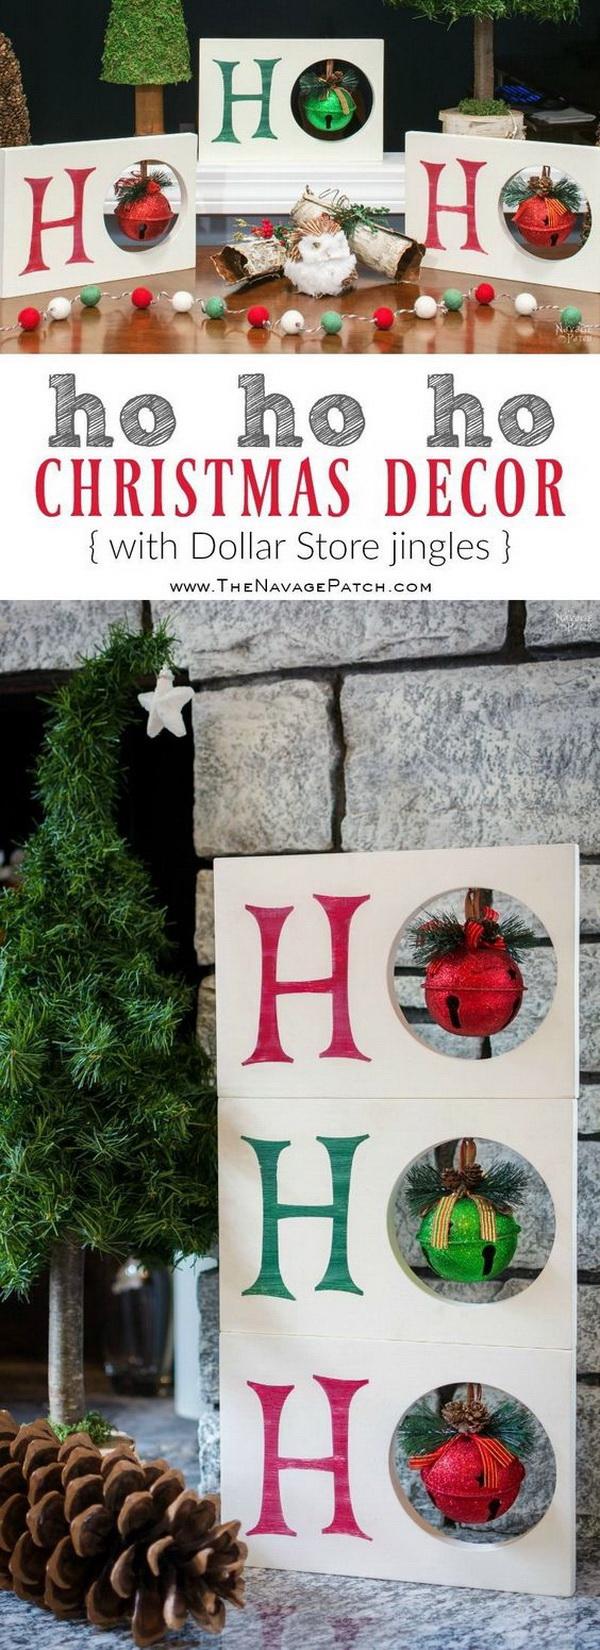 DIY HO HO HO Christmas Decor. This HO HO HO Christmas decor will look fantastic with your holiday décor!